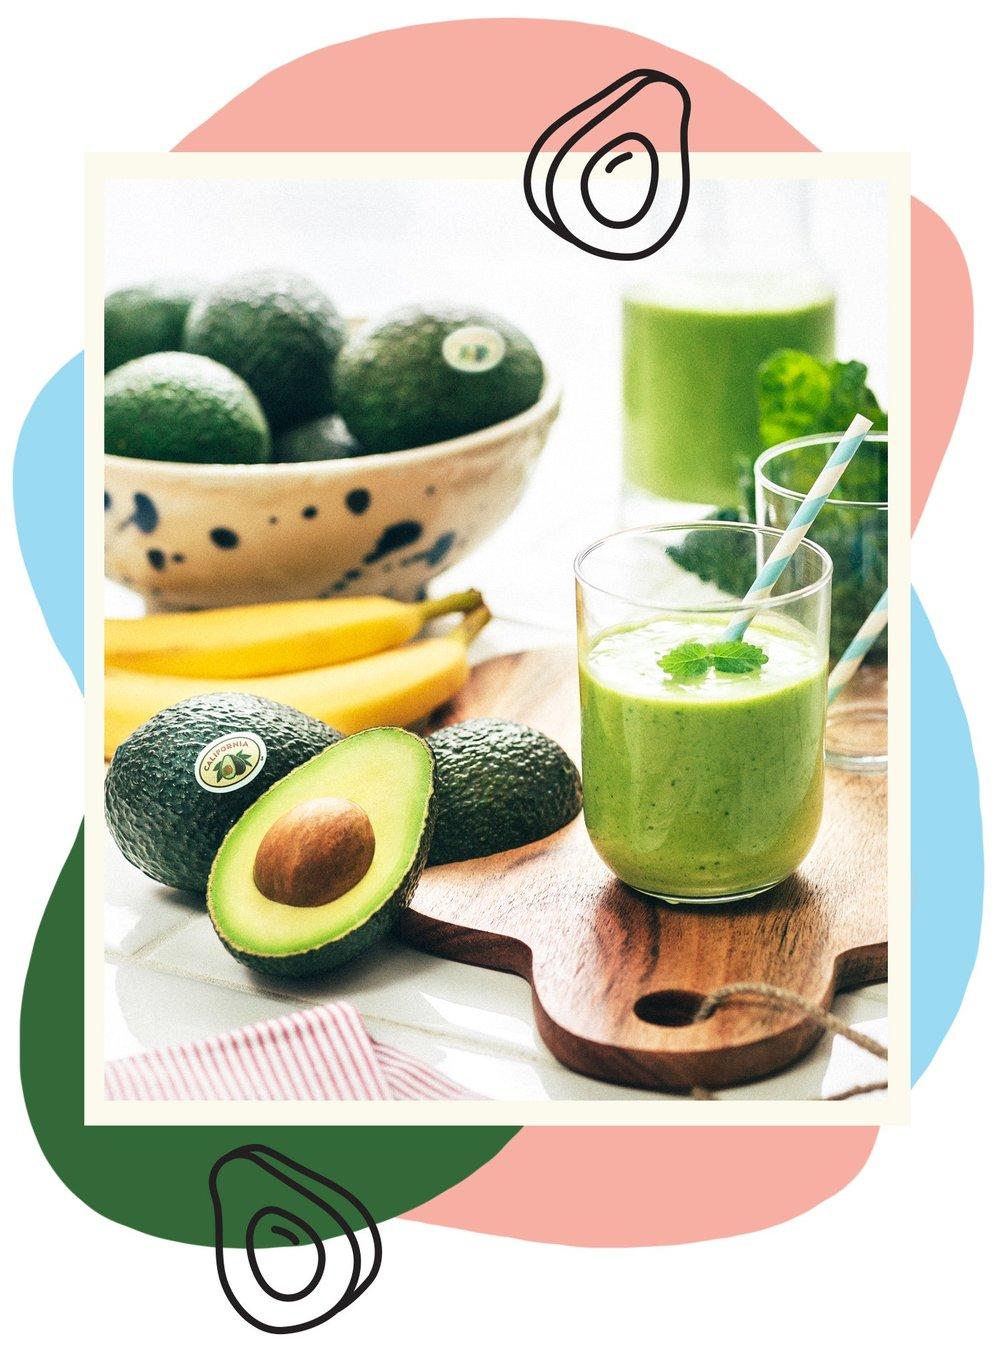 7208c72a-bf4c-418c-a31d-bc08a67d9e03-cali-avocado-smoothie.jpg